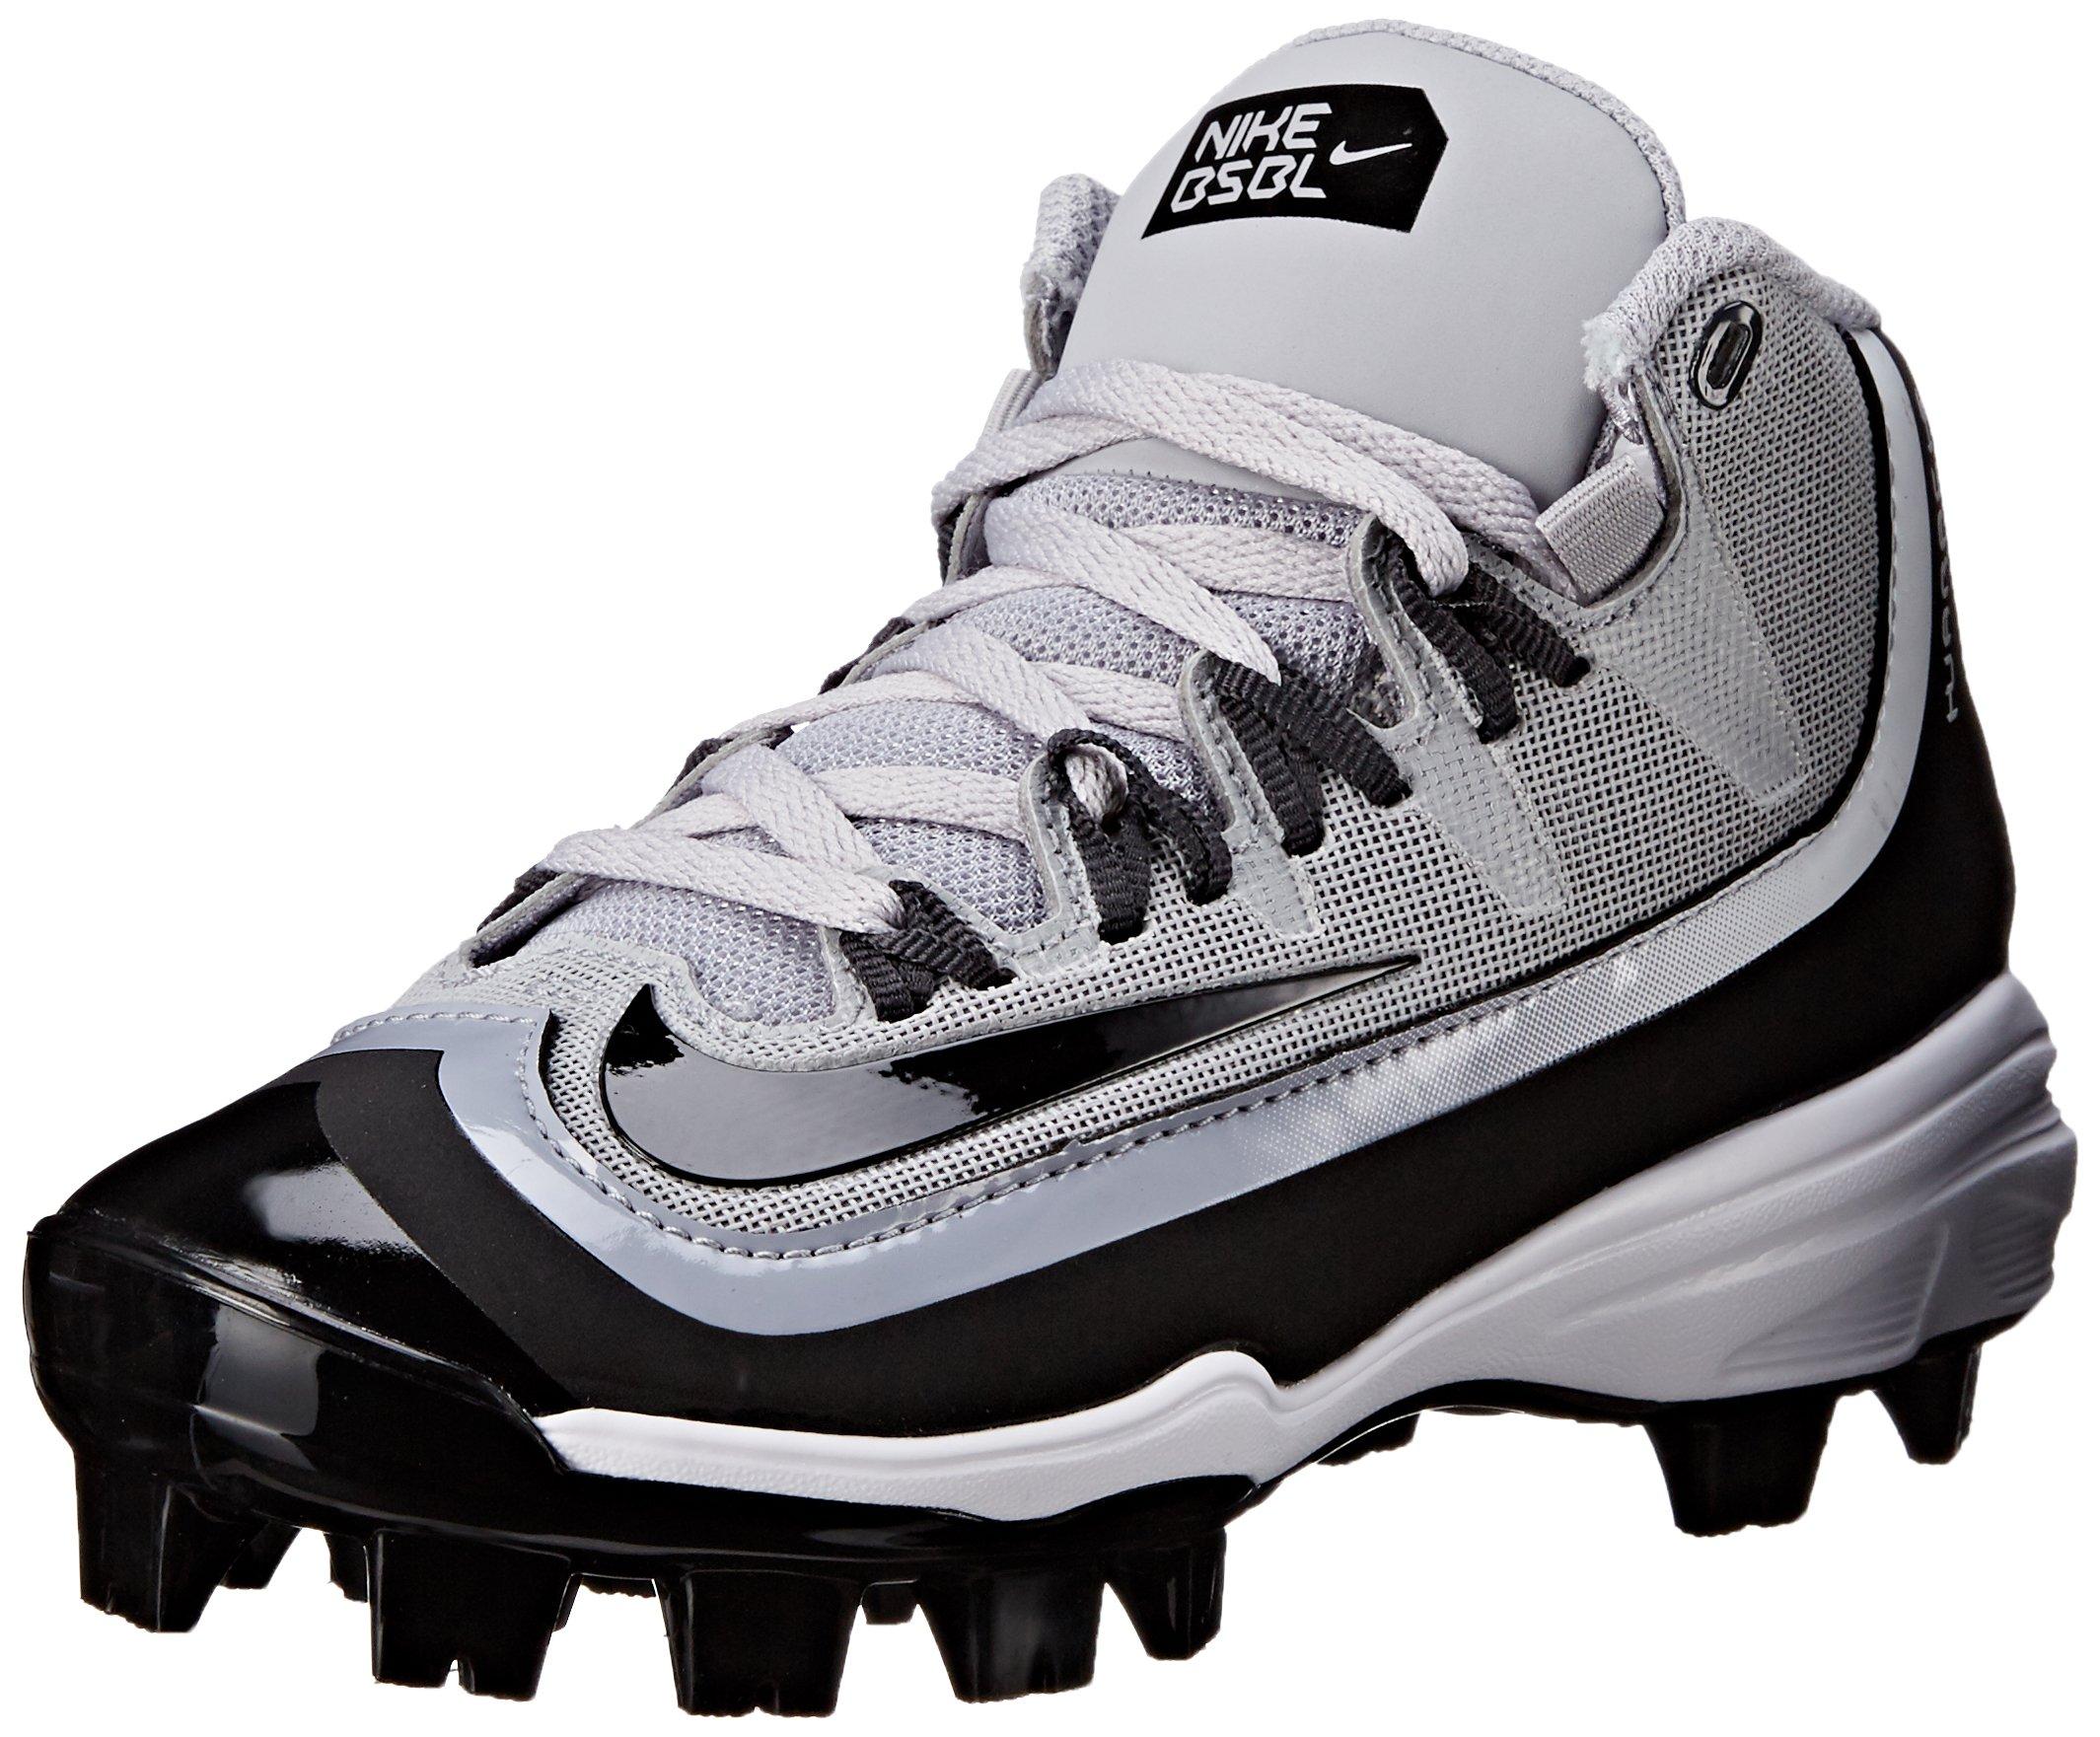 NIKE Boy's Huarache 2KFilth Pro (GS) Baseball Cleat Grey/Anthracite/White/Black Size 1.5 M US